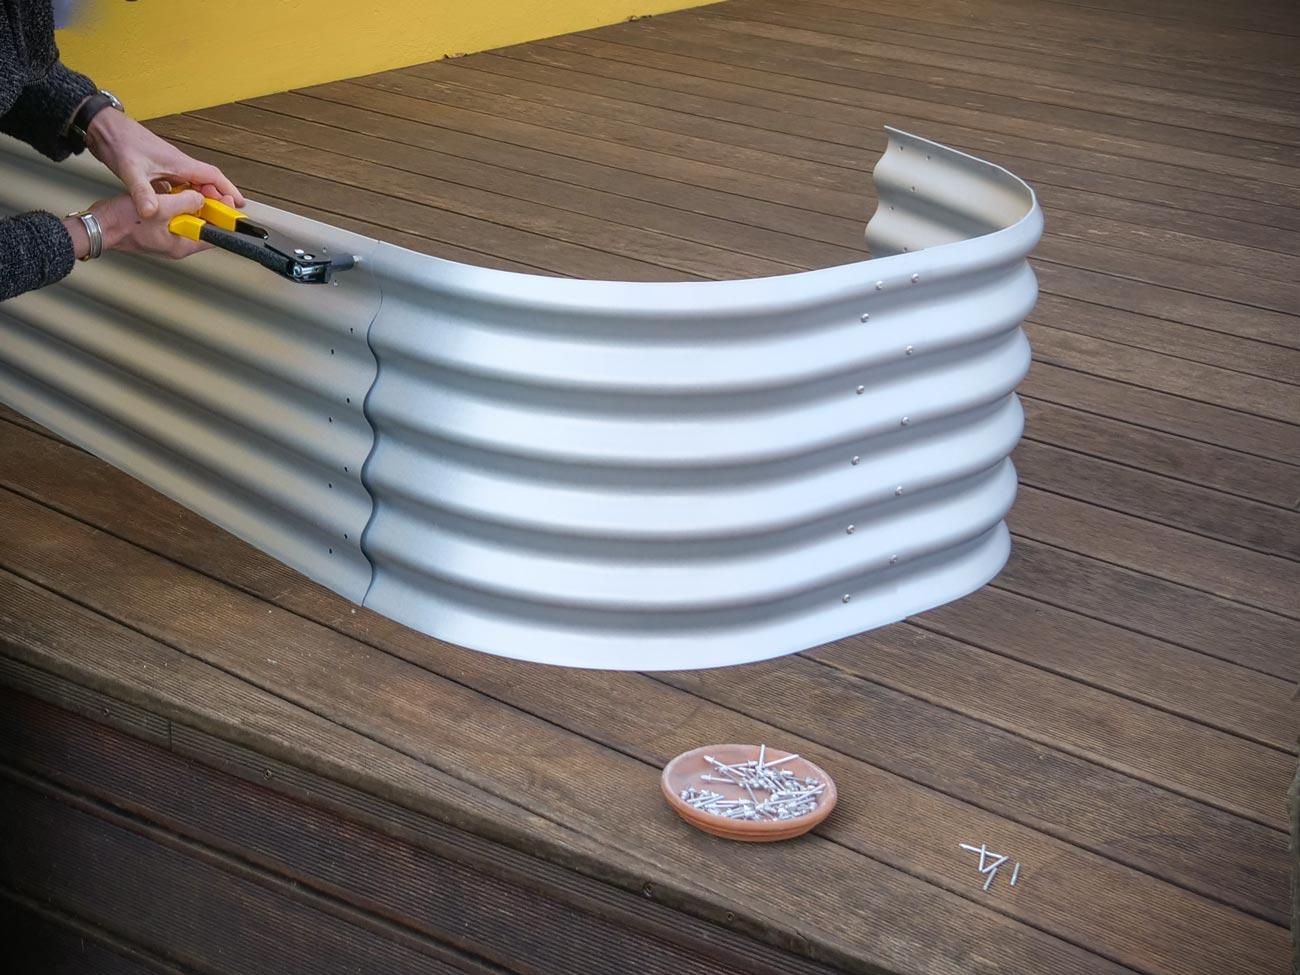 Hochbeet-selber-bauen-Metall-01